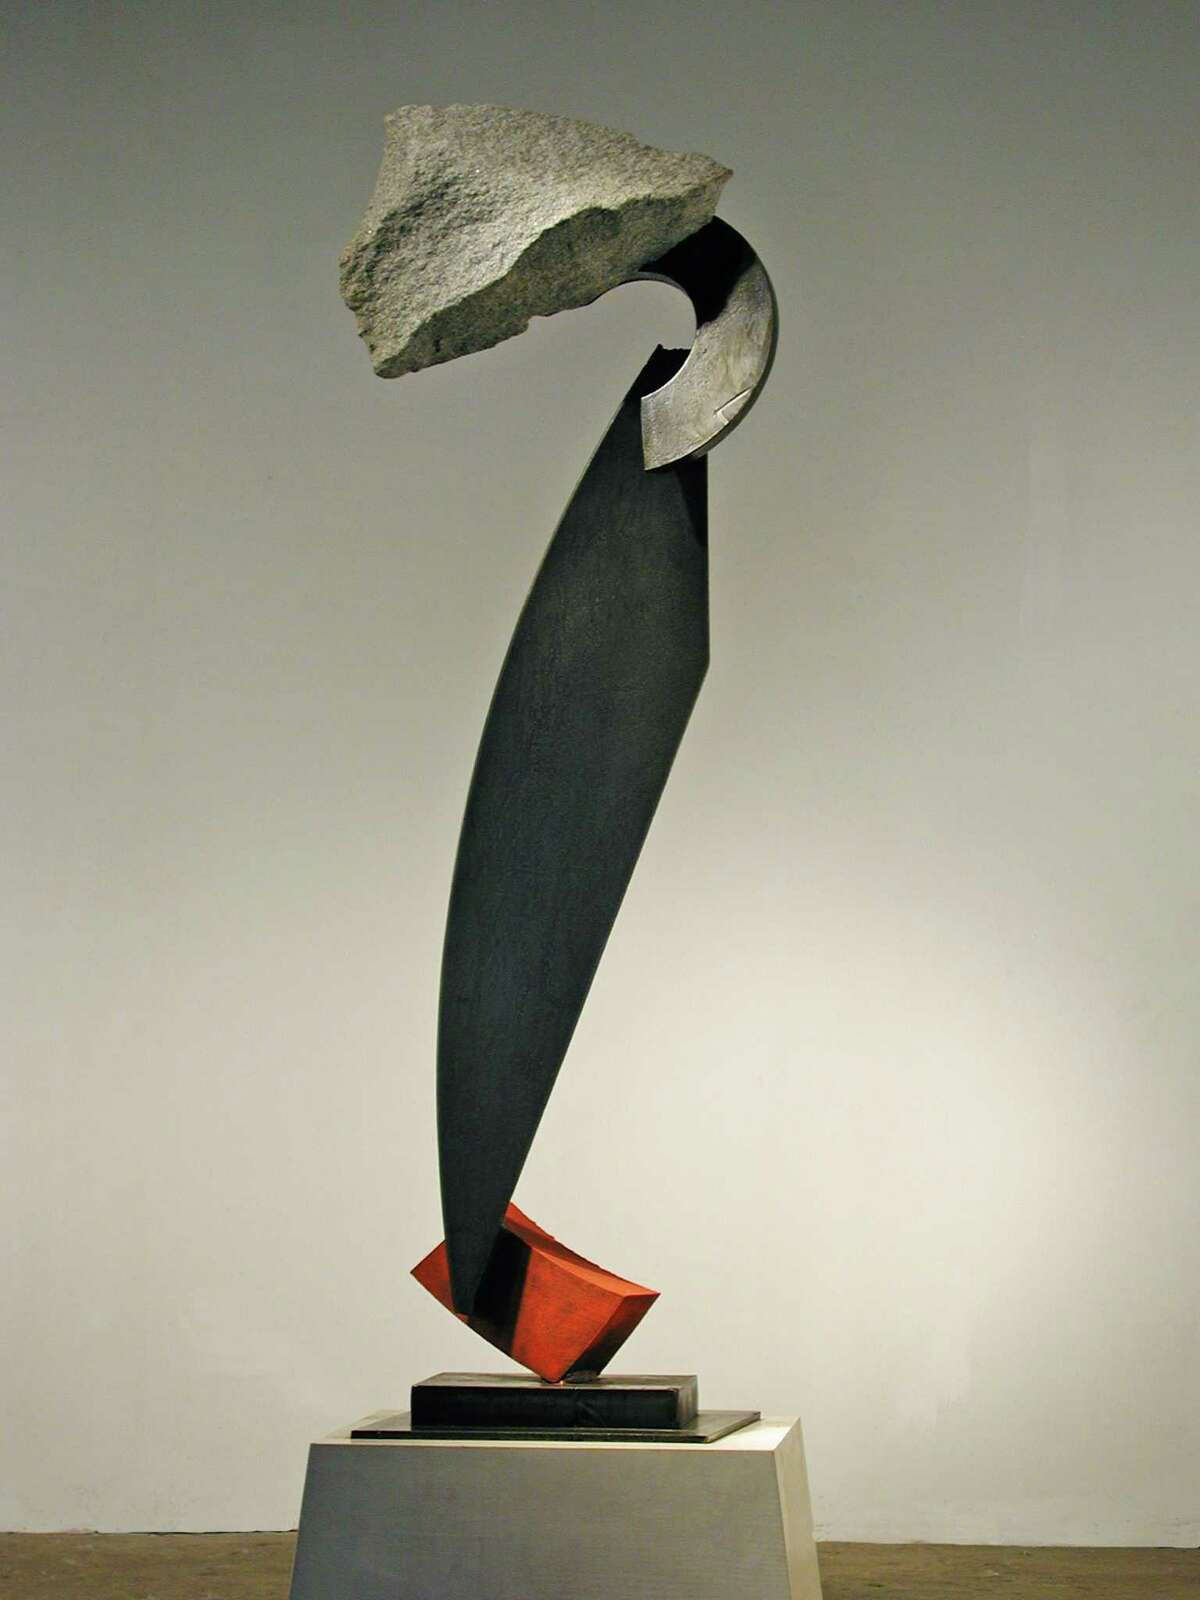 "John Van Alstine's Pique, 2002, granite, pigmented and sealed steel, 62"" x 24"" x 12"" (Courtesy Opalka Gallery)"